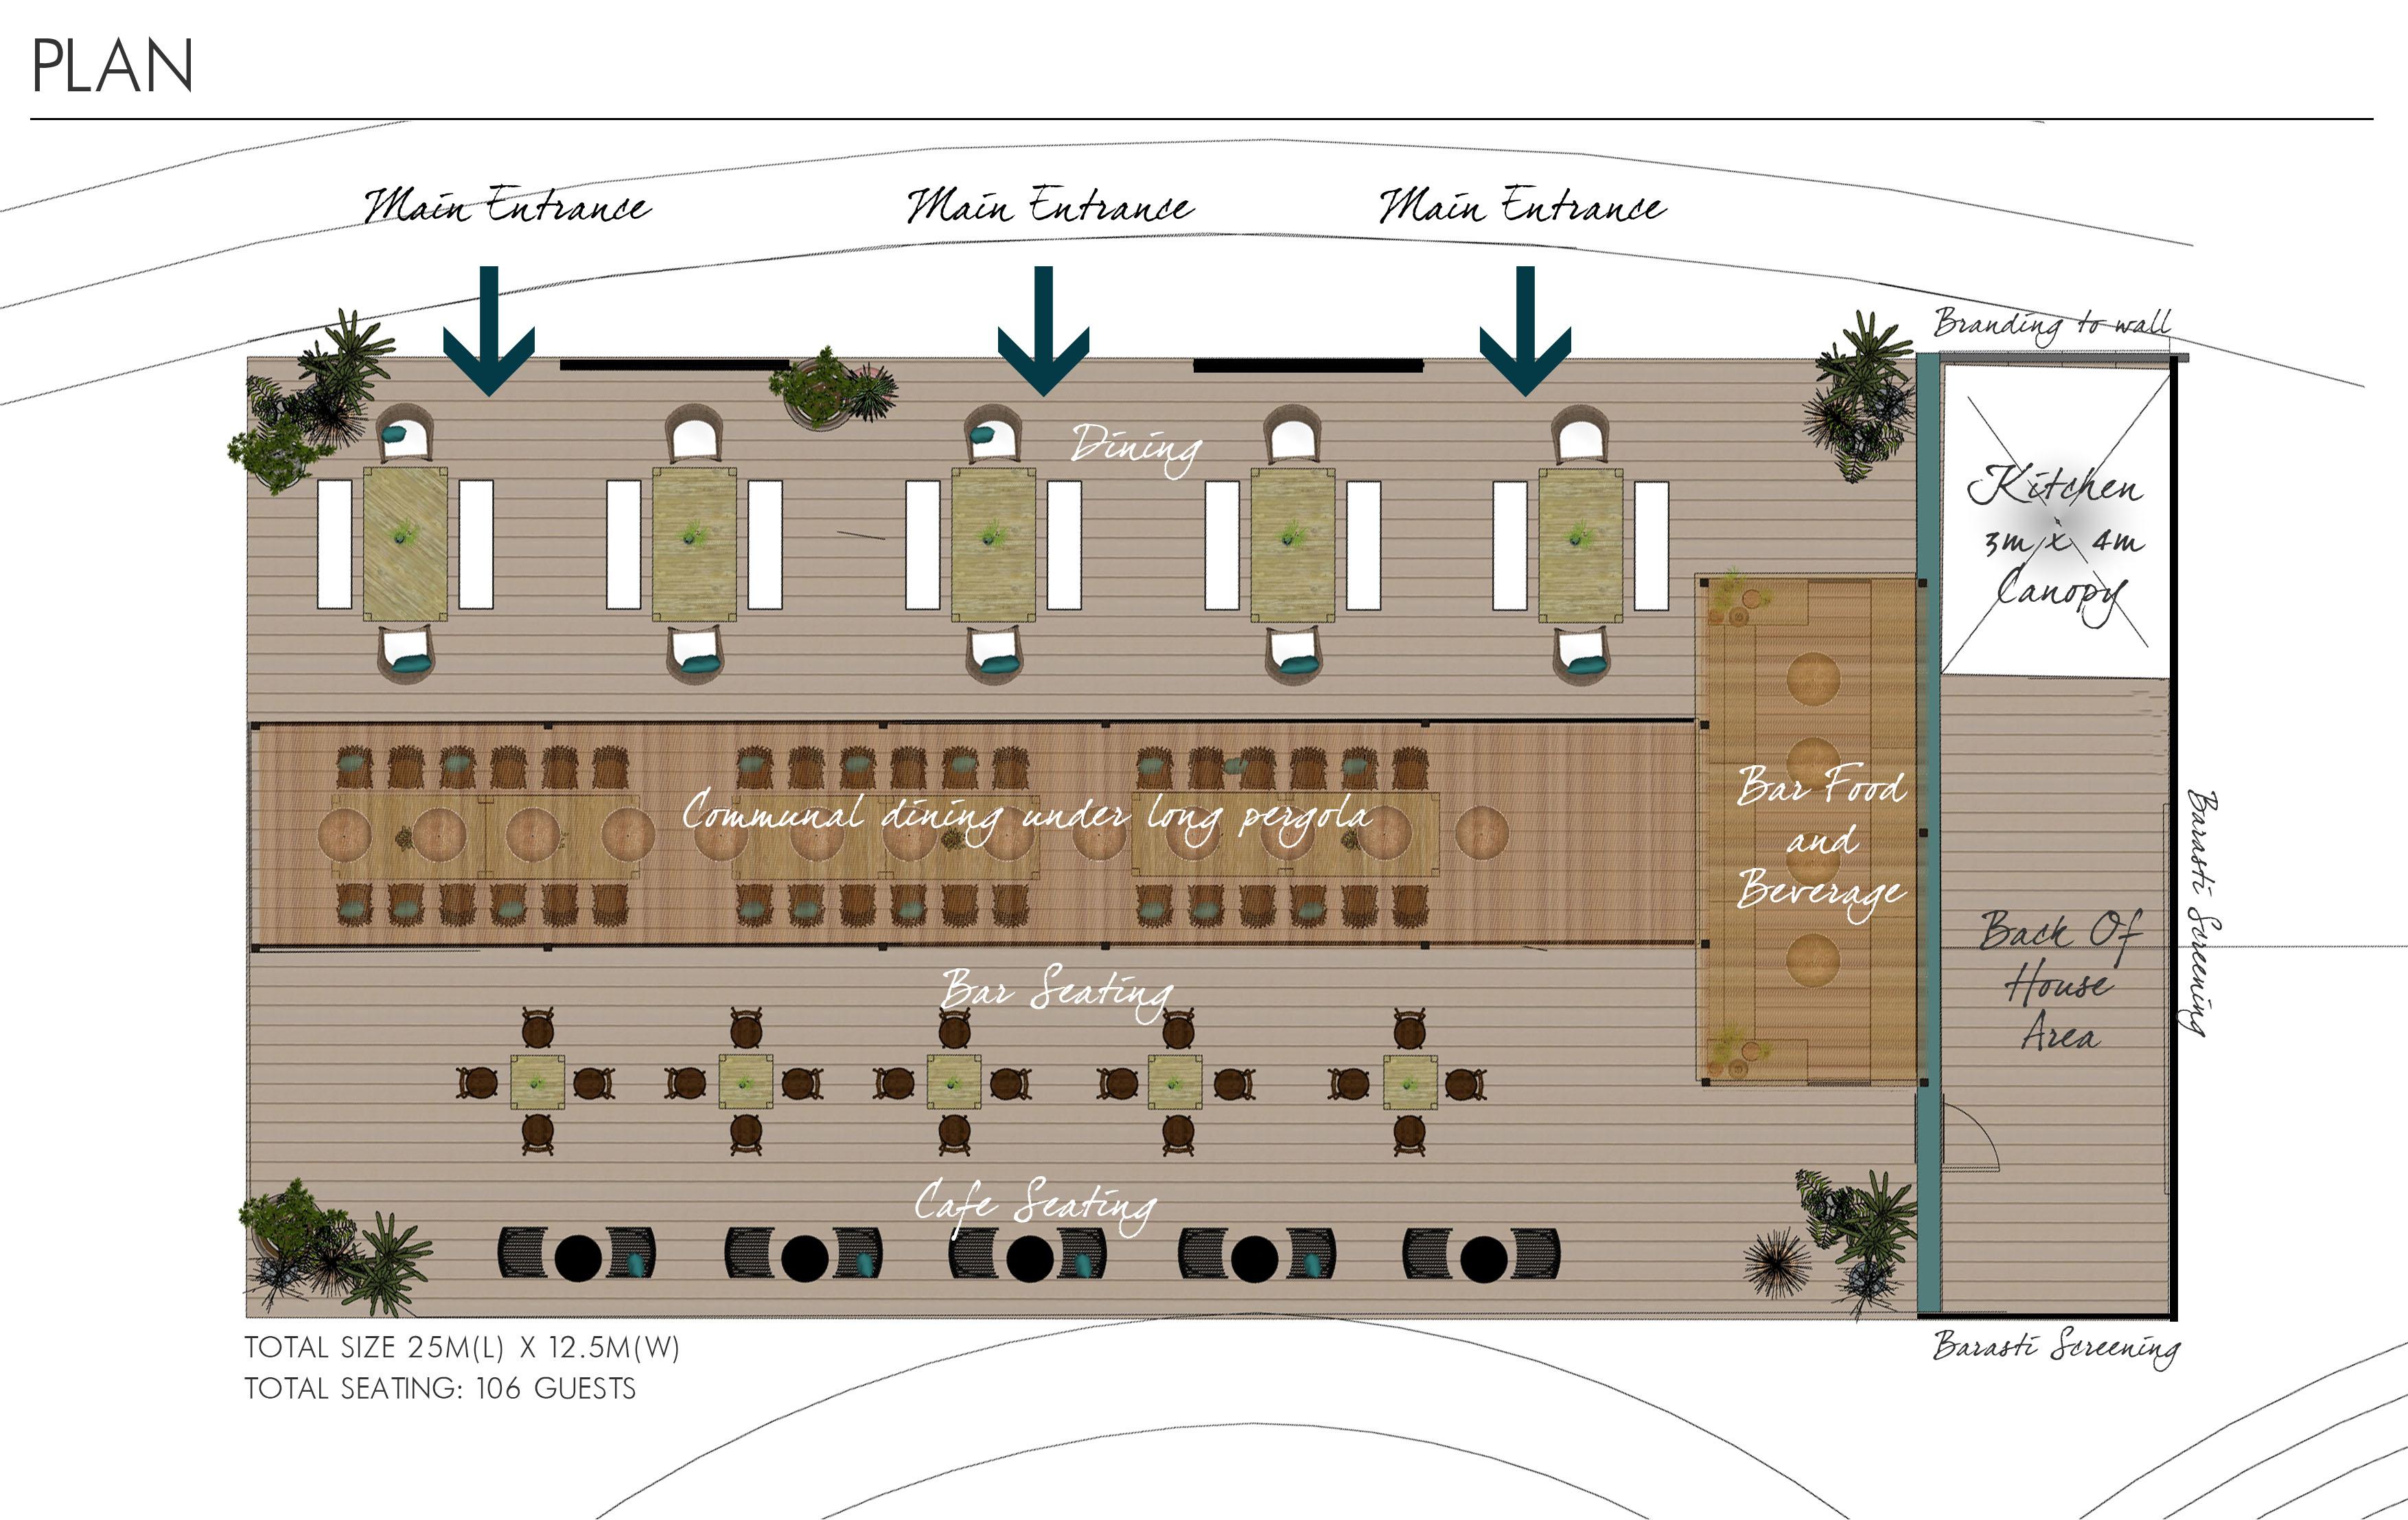 Event Design - Plan View